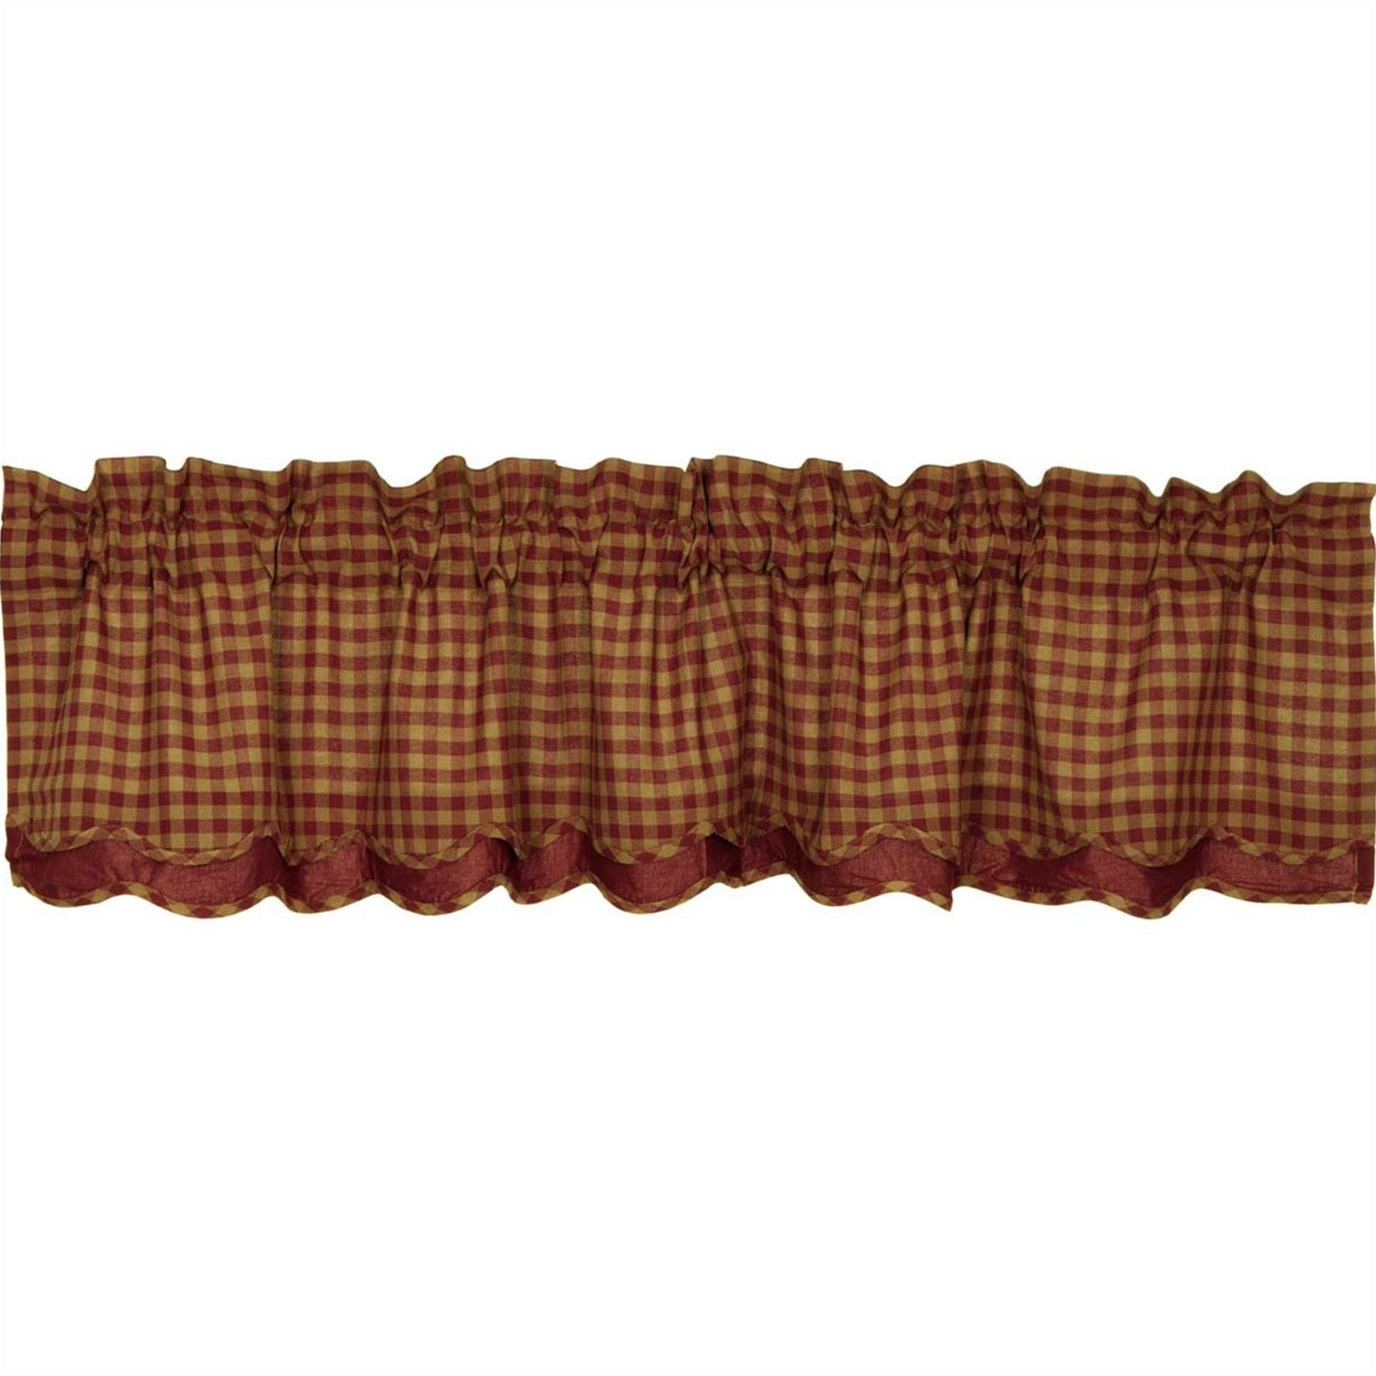 Burgundy Check Scalloped Layered Valance 16x72